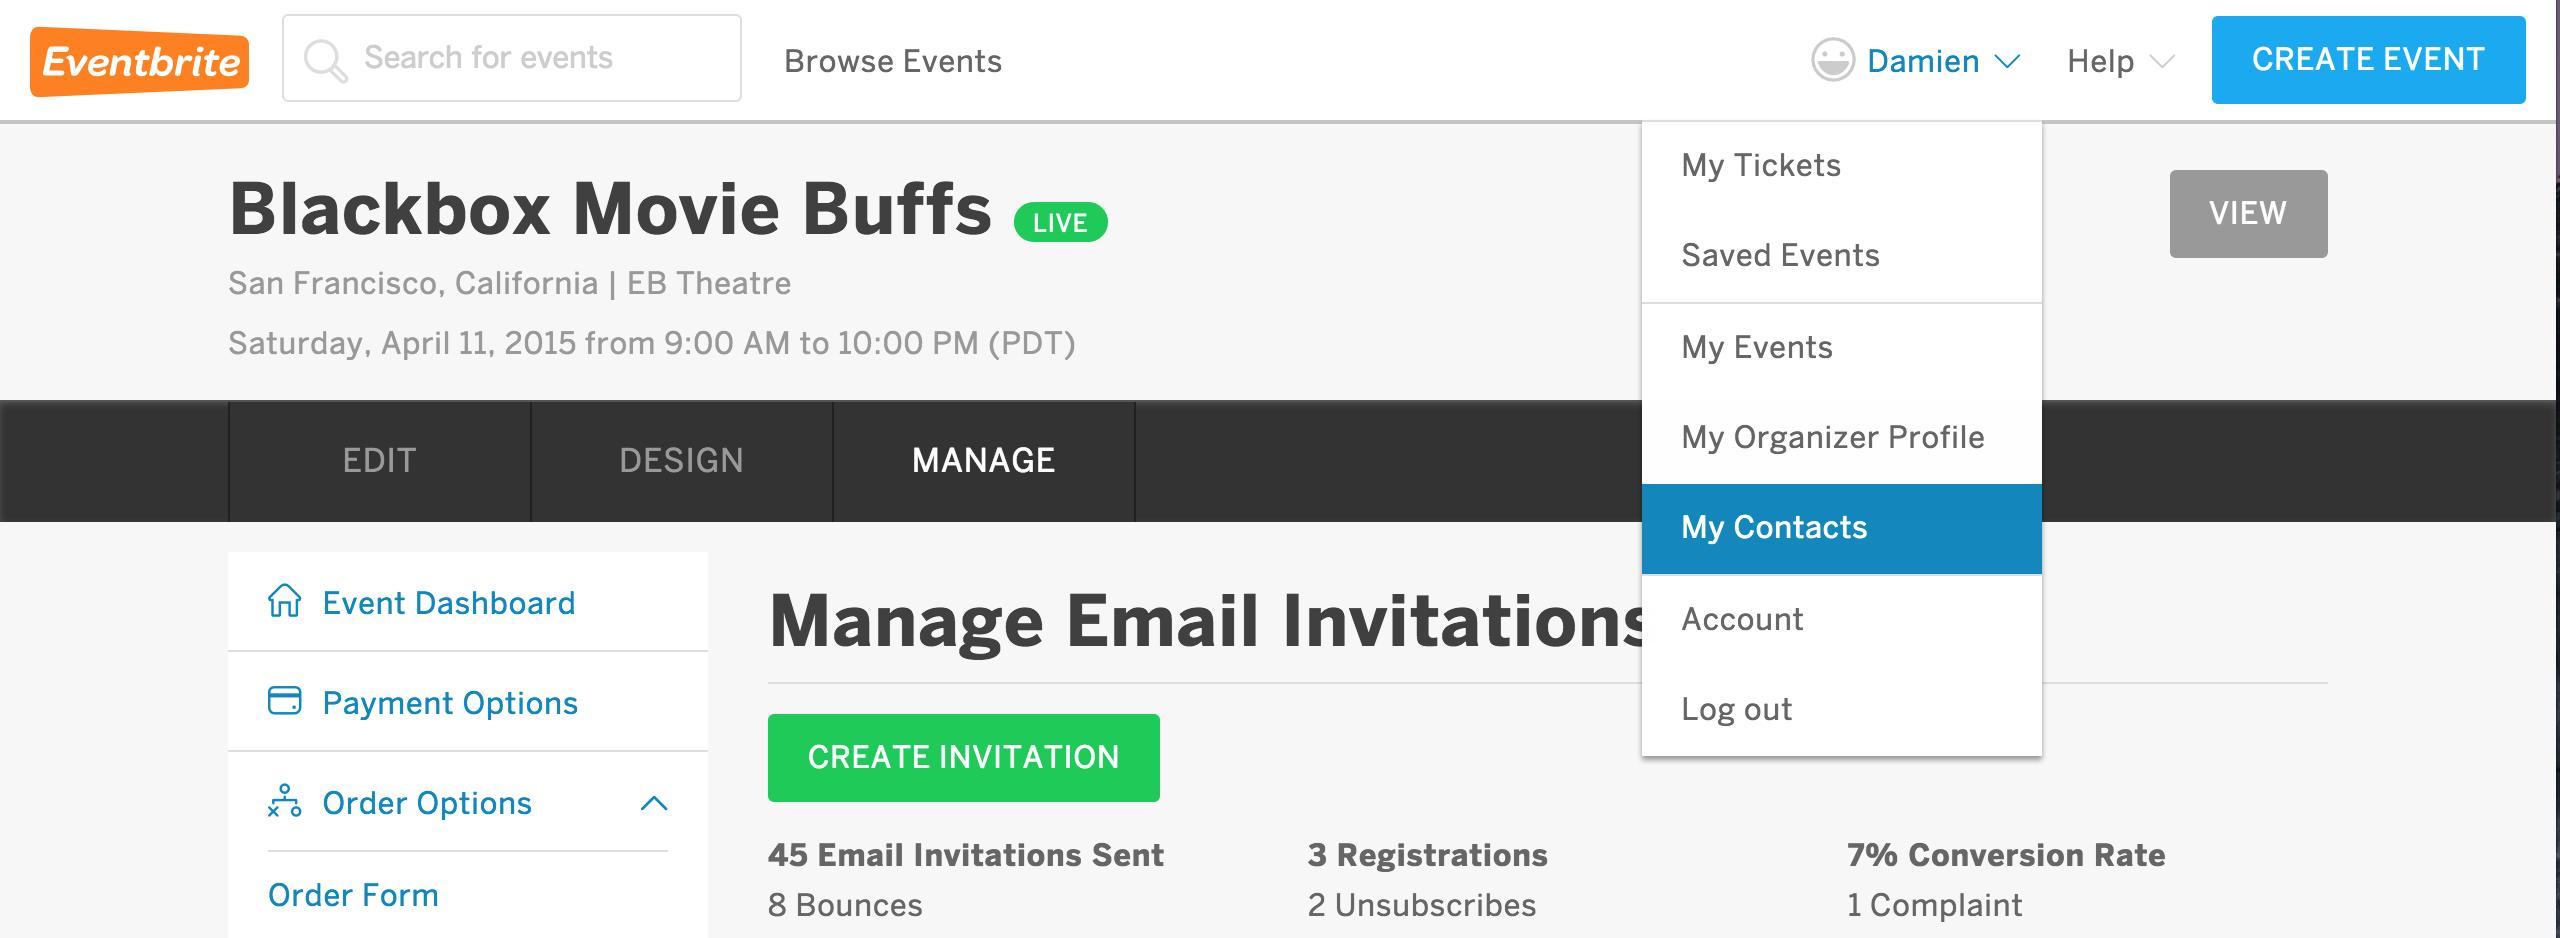 how to delete my eventbrite account